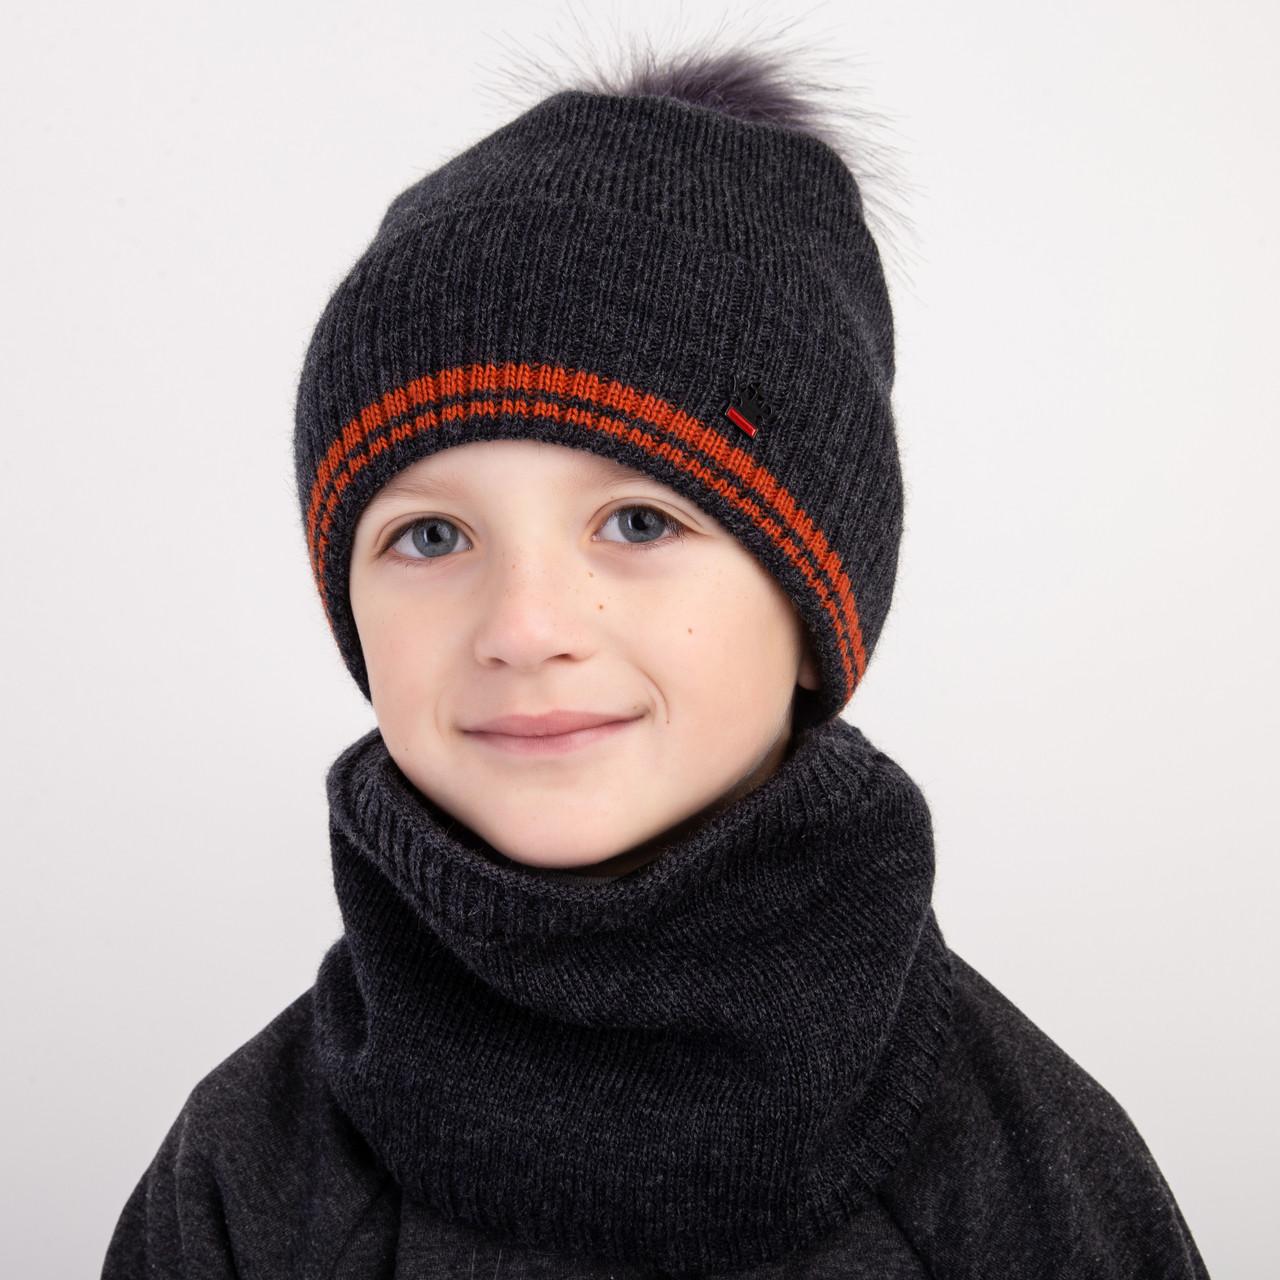 Комплект на зиму для мальчика с помпоном - Артикул 2407